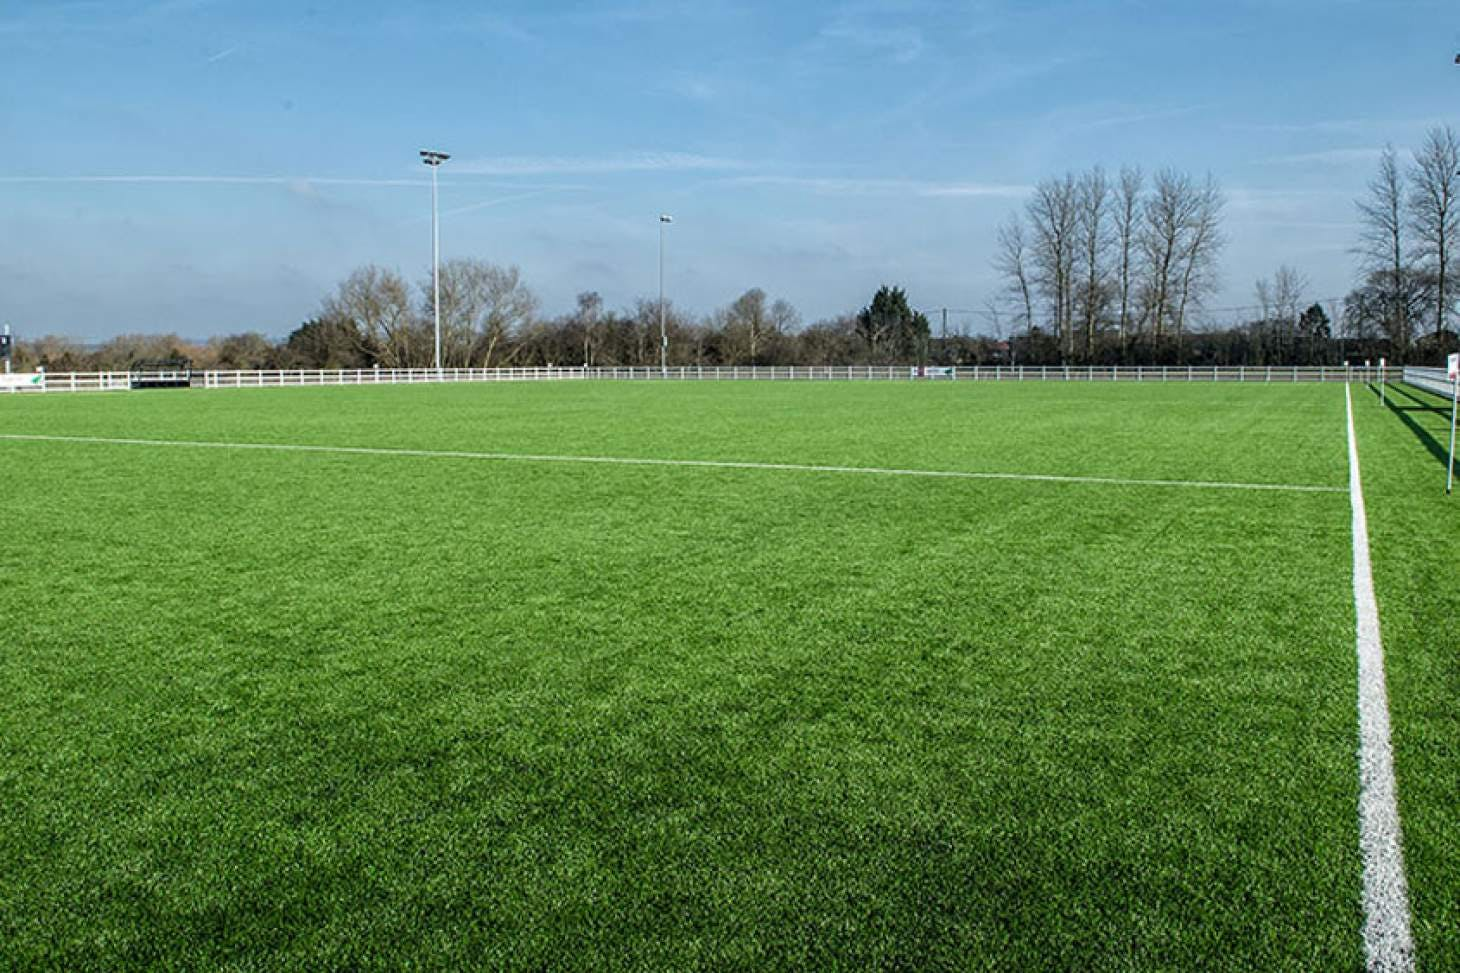 PlayFootball Wanstead 8 a side | 3G Astroturf football pitch